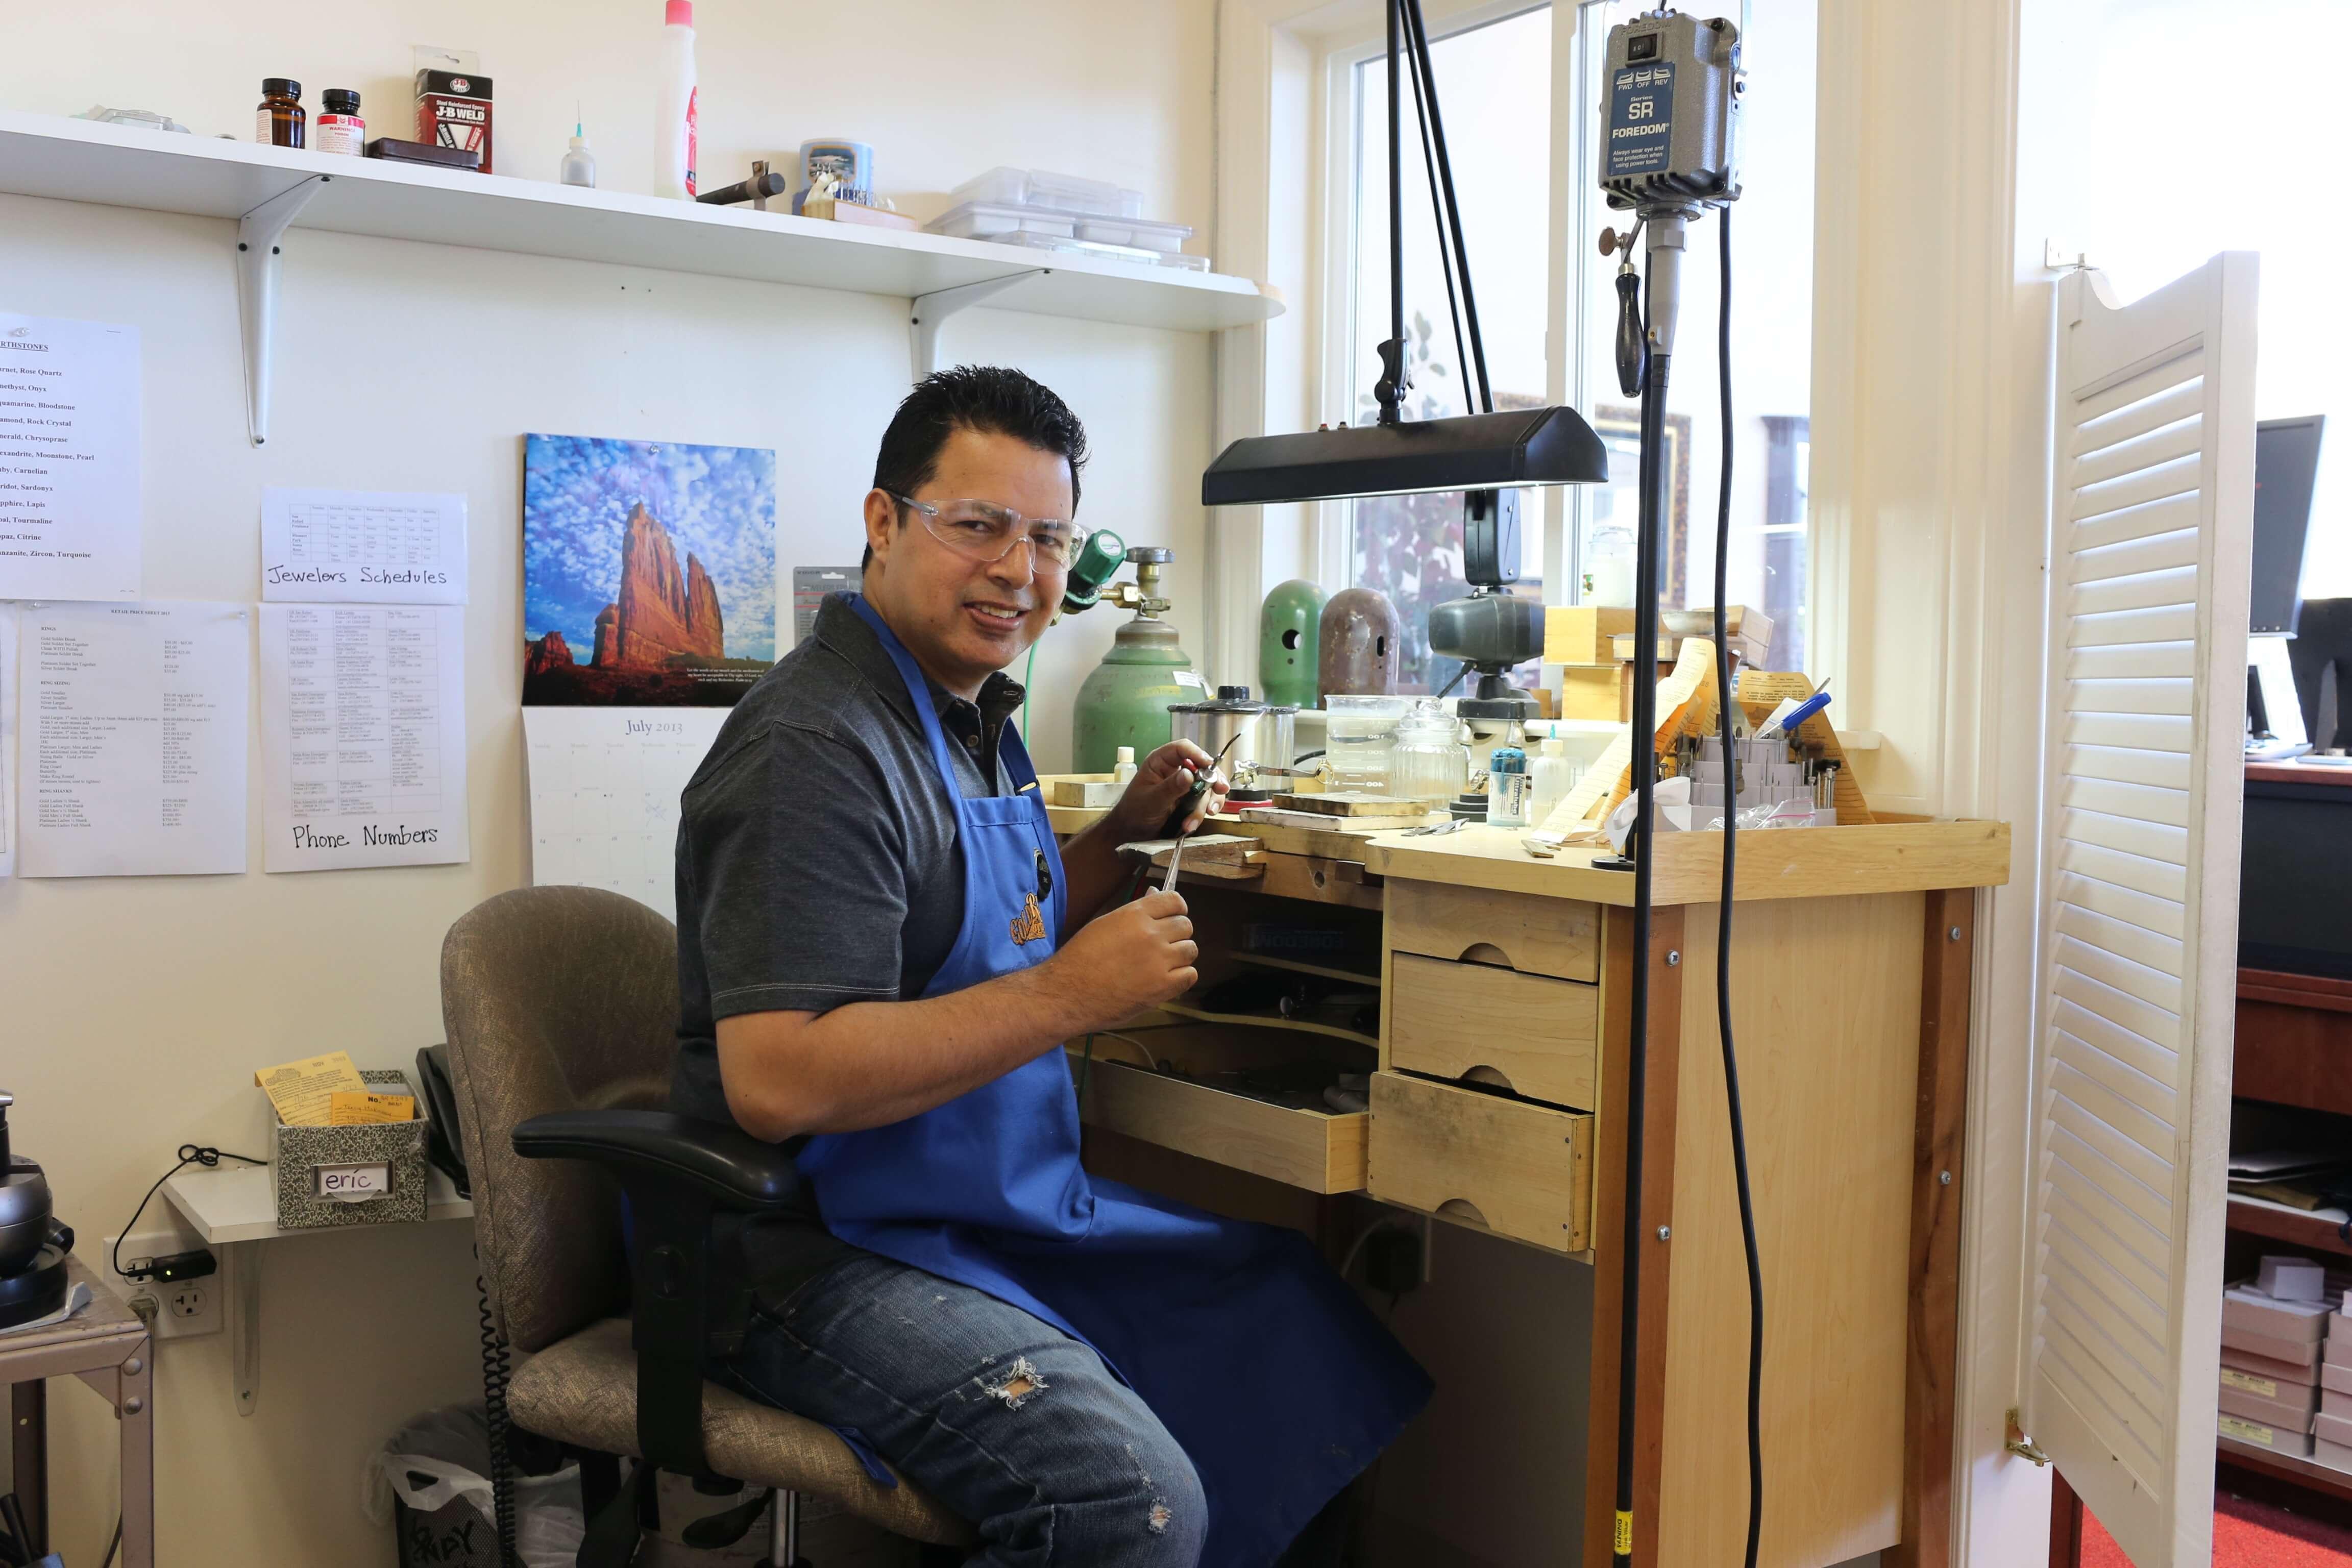 Jeweler working at Gold Rush Jewelers in Novato, CA